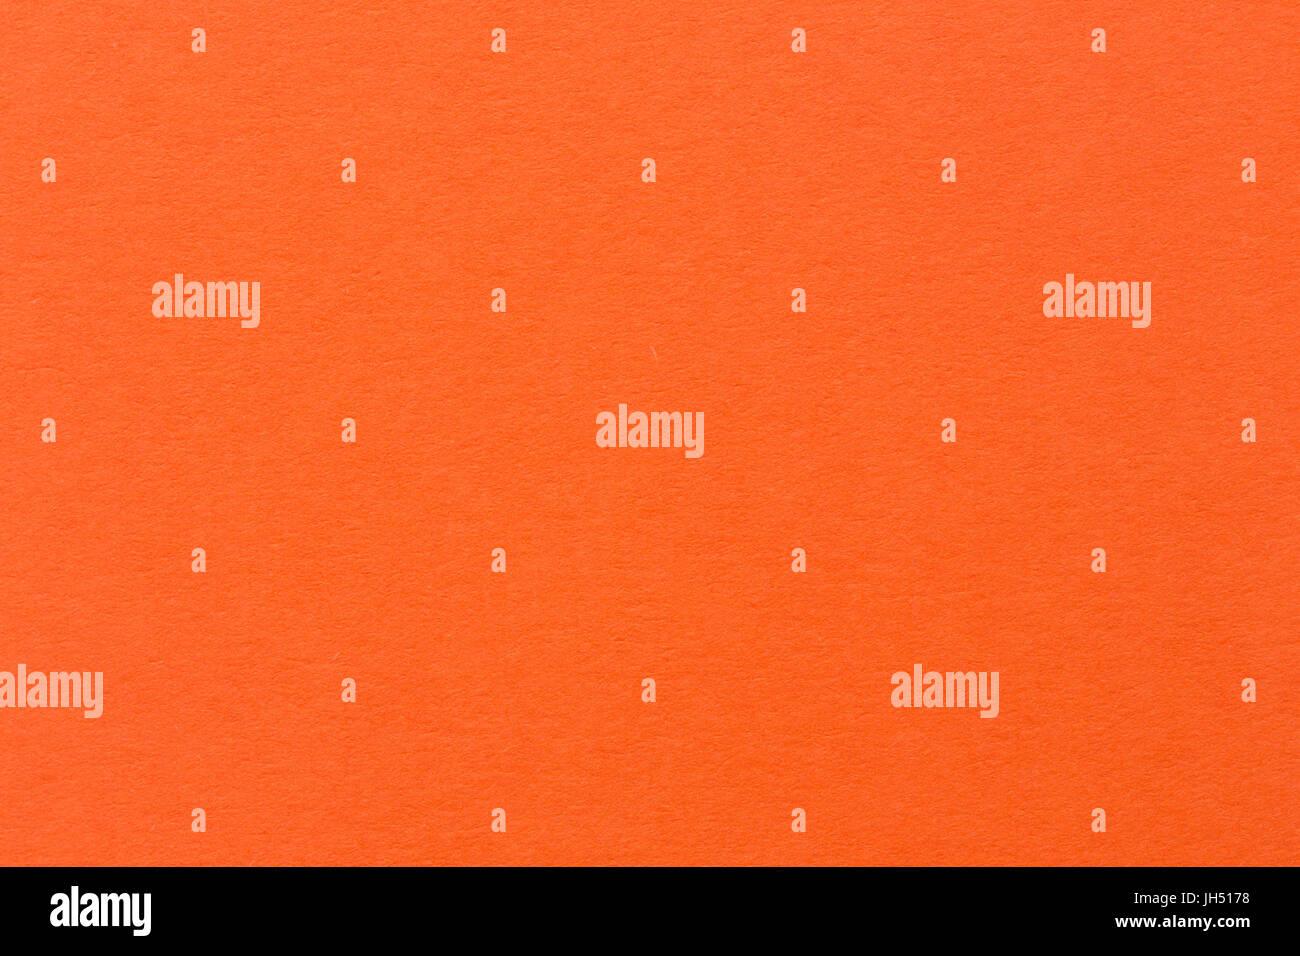 Light Orange Paper Wall Texture Background